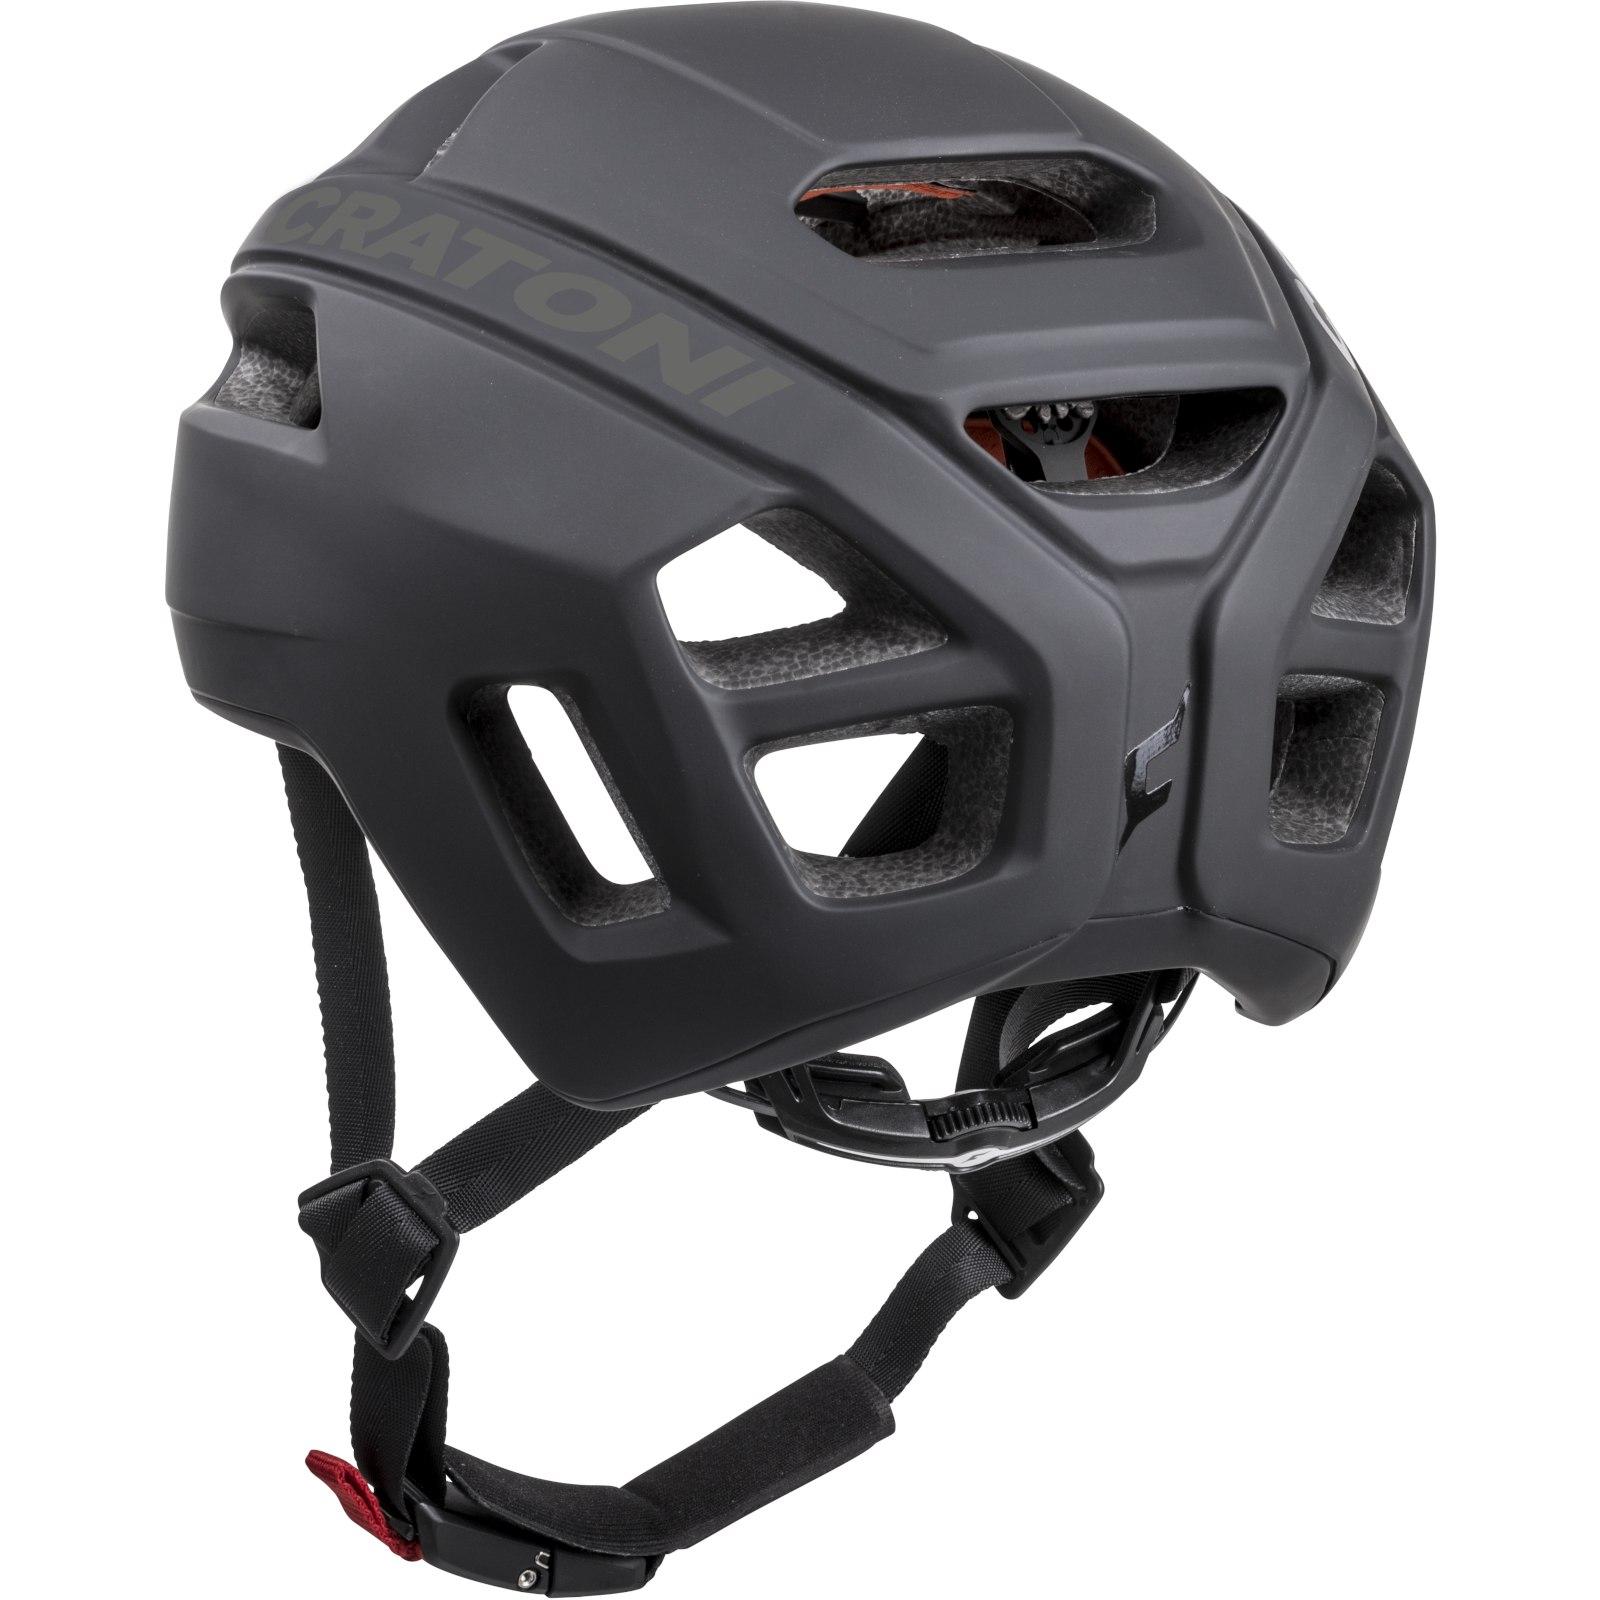 Image of CRATONI C-Pro Helmet - lime rubber